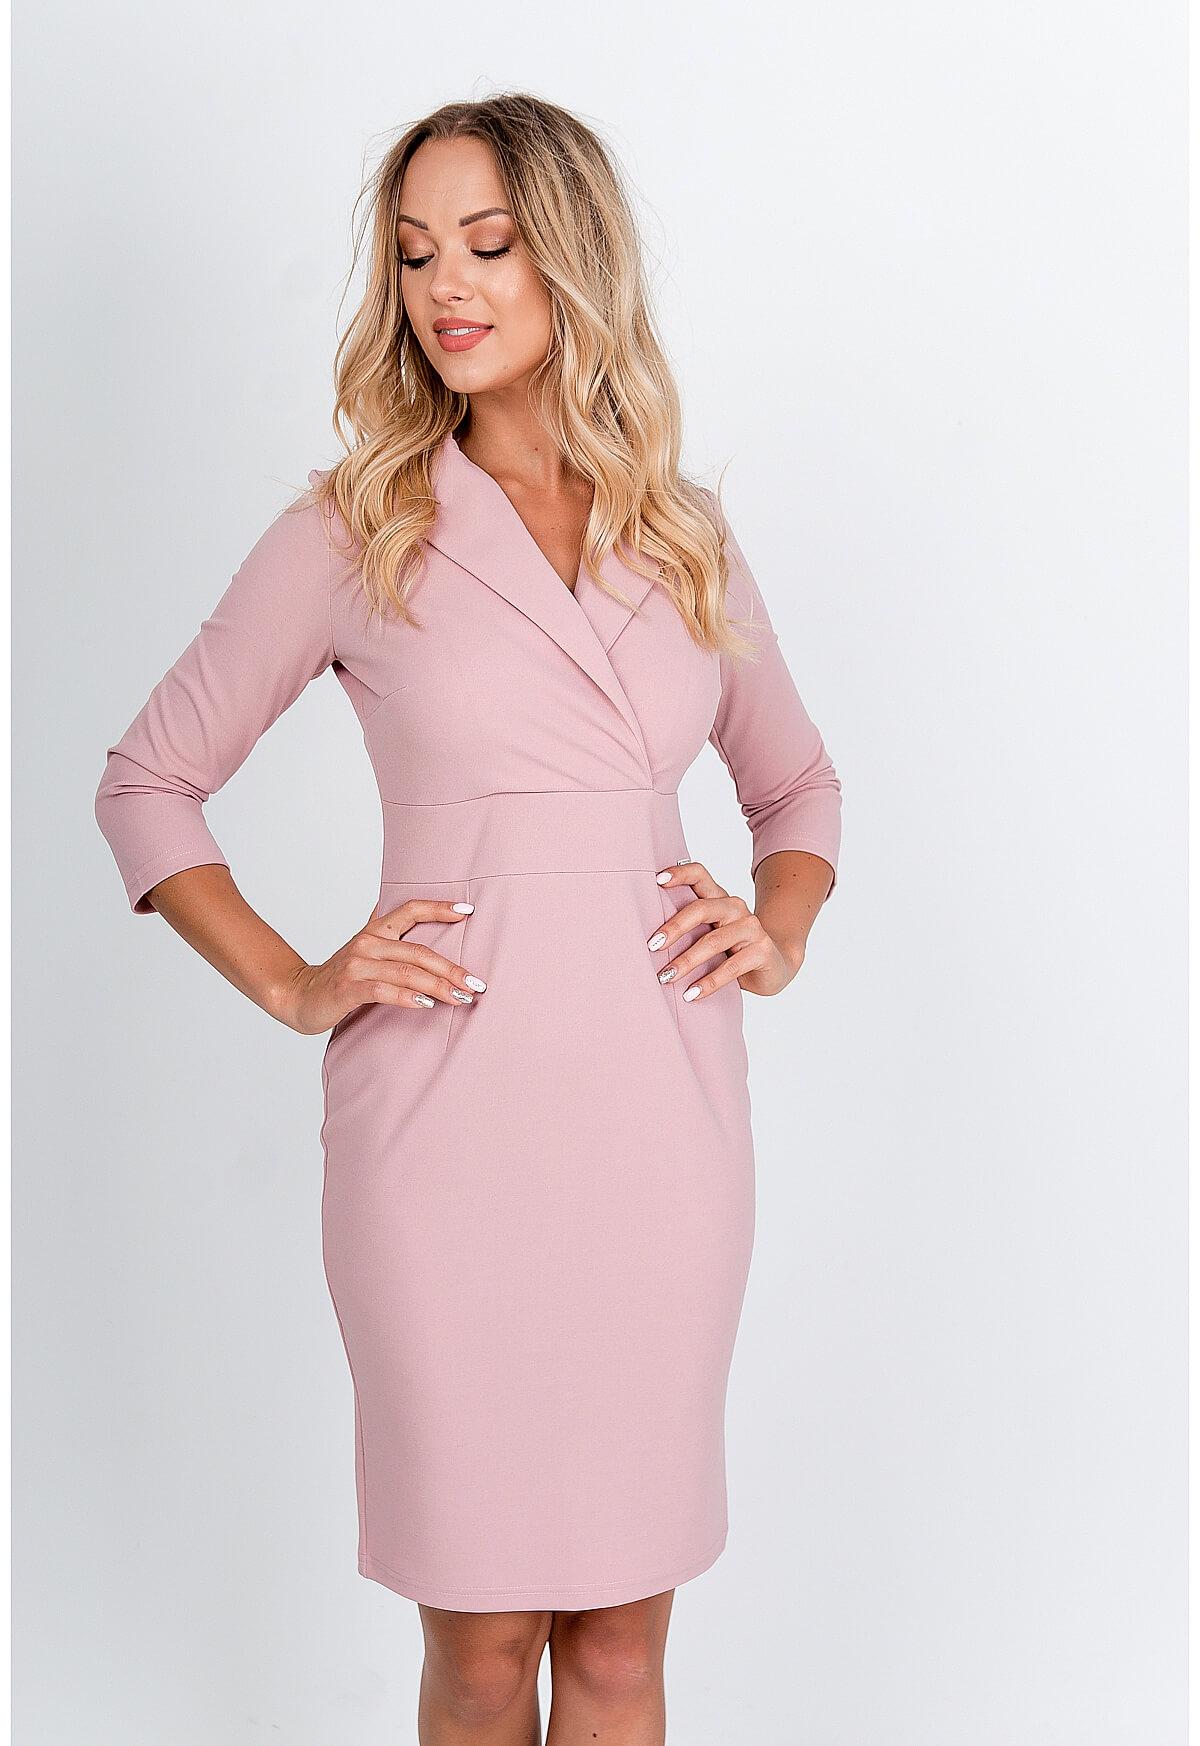 Ružové polodlhé večerné šaty - L